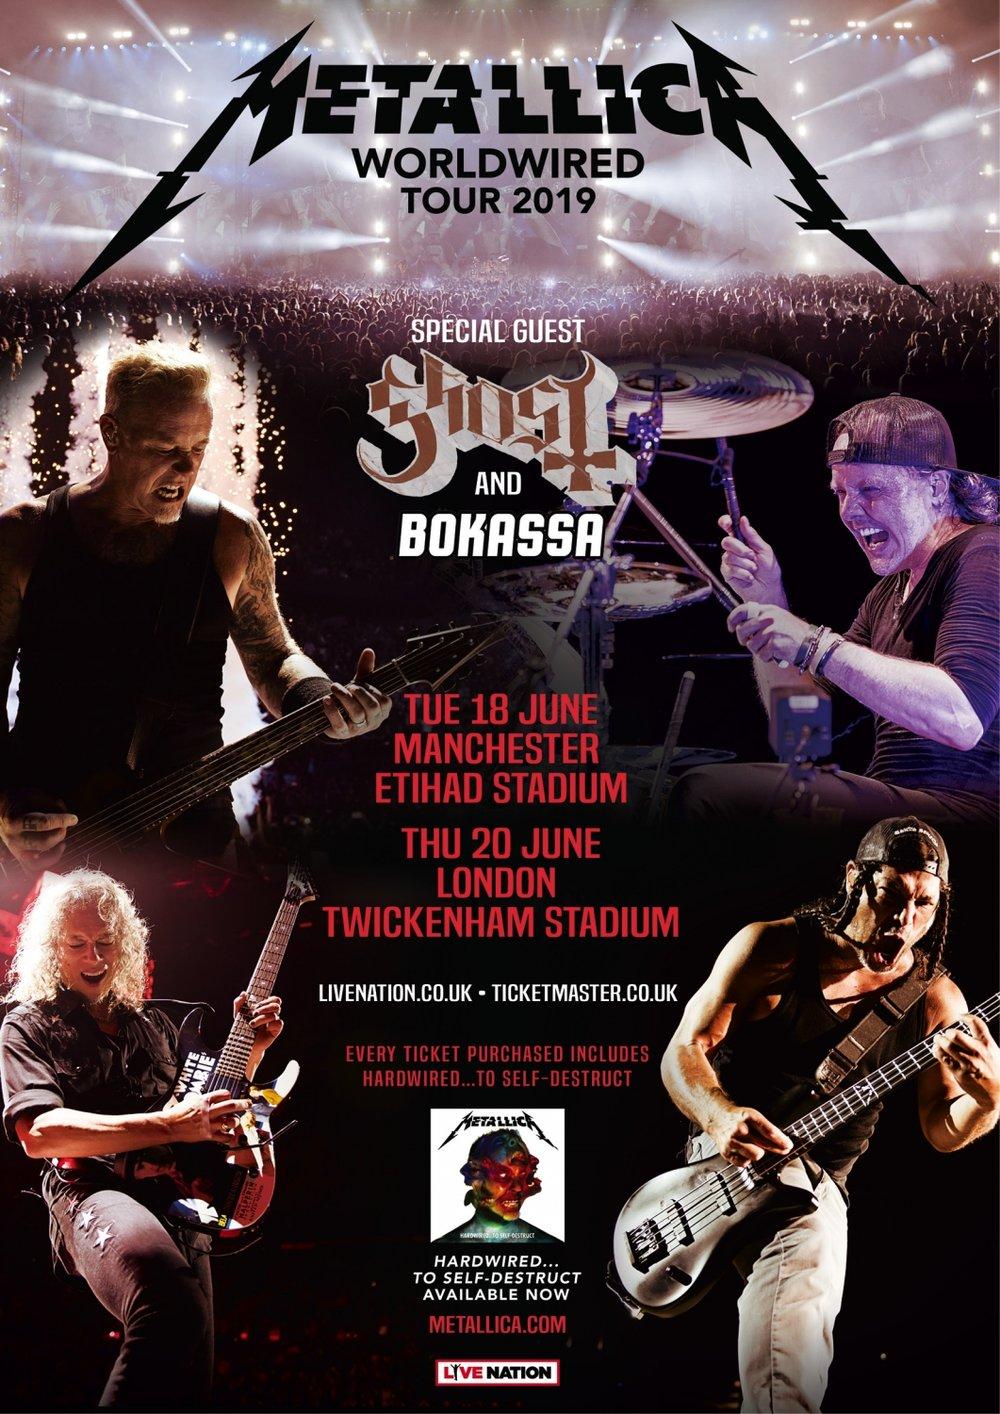 Metallica at the Etihad Stadium, Manchester on June 18th 2019 Poster